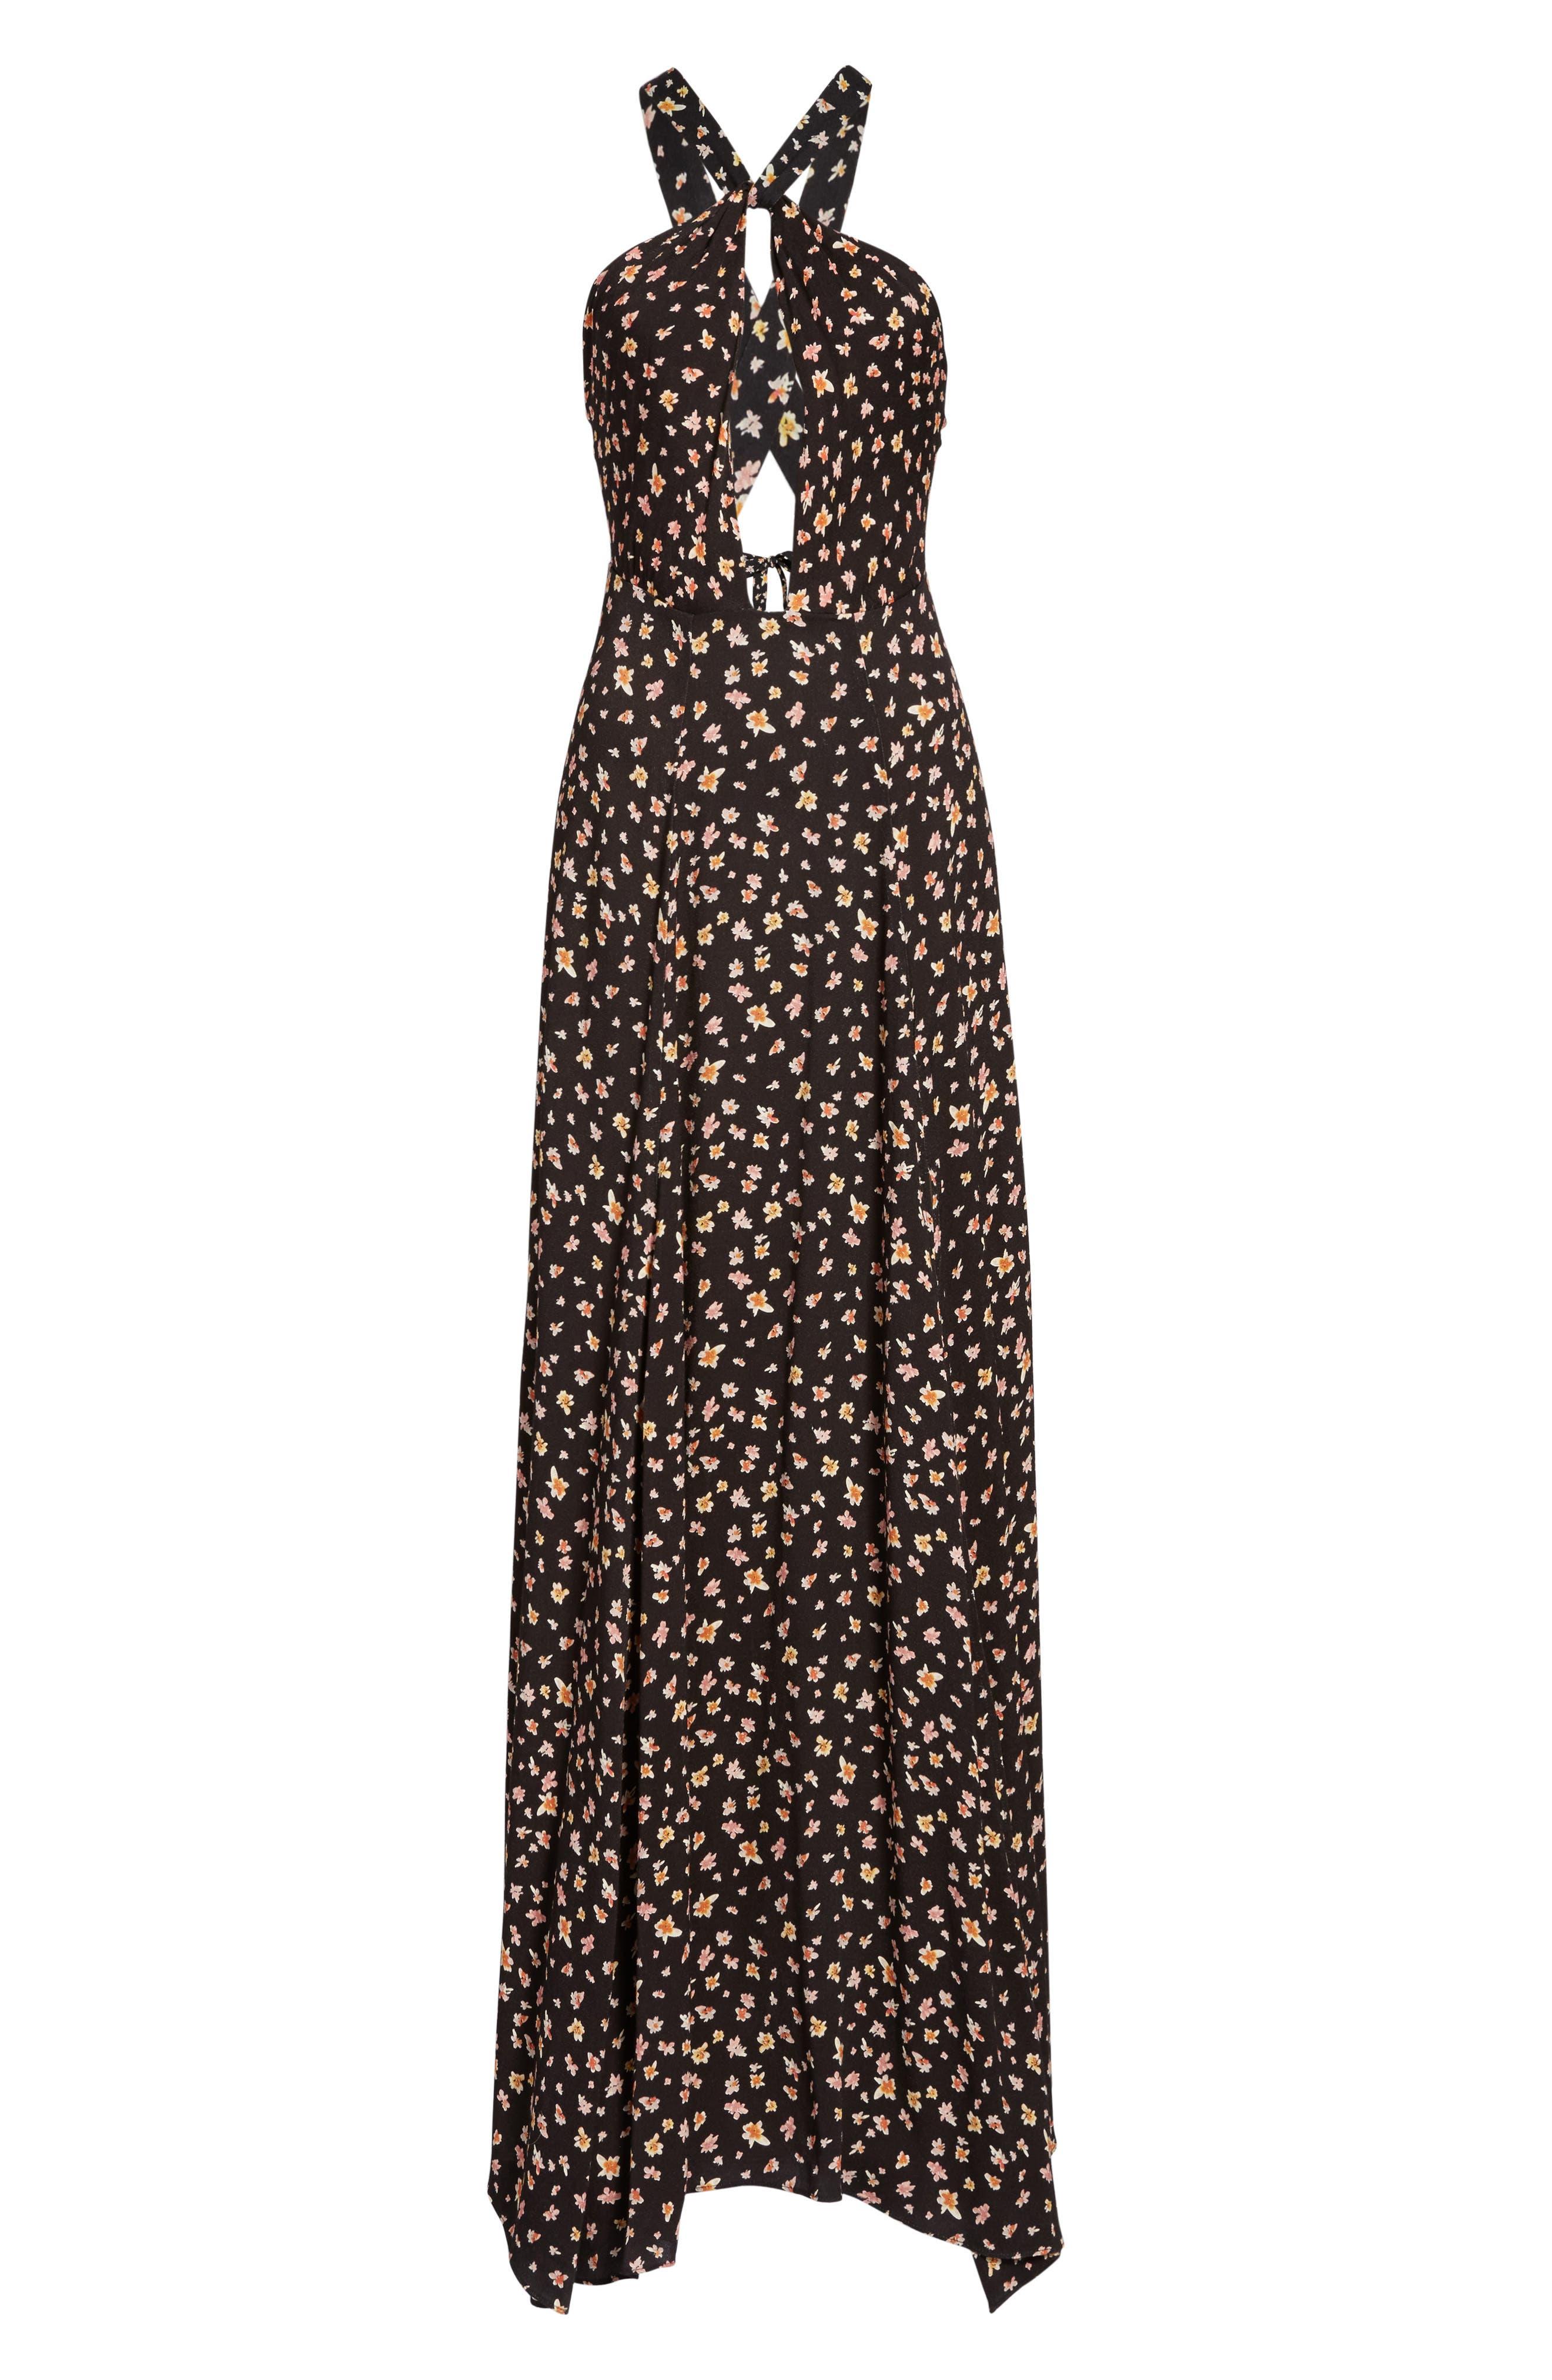 Harlean Halter Maxi Dress,                             Alternate thumbnail 6, color,                             010